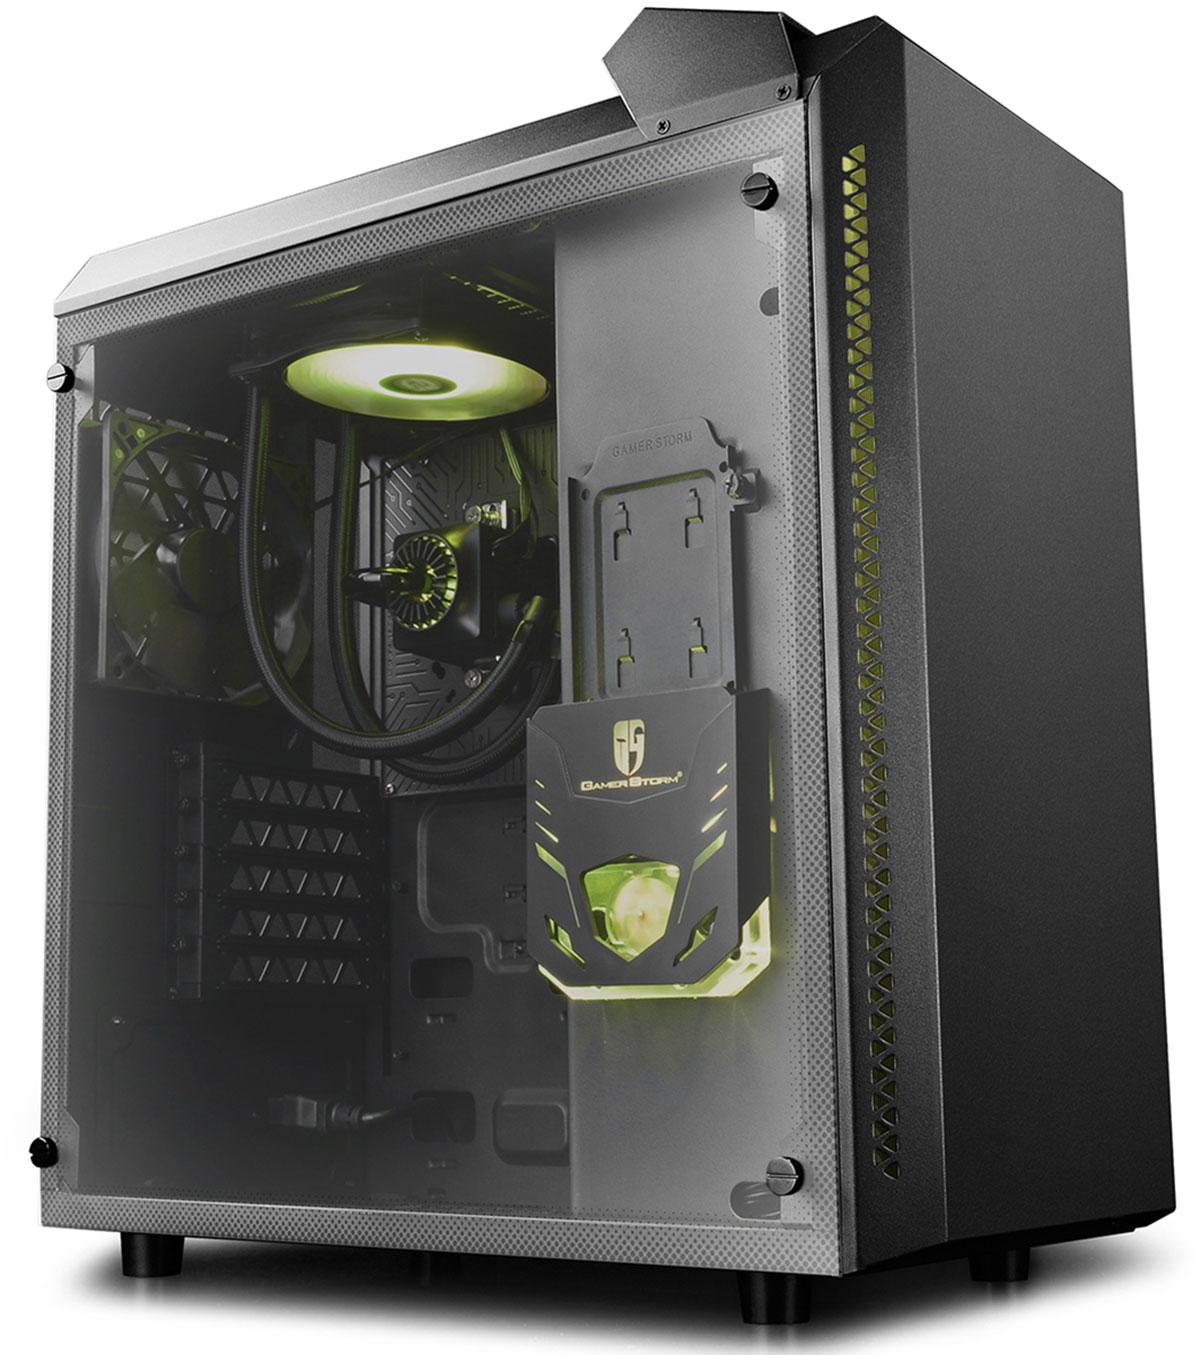 deepcool gamer storm baronkase liquid bo tier pc deepcool sur. Black Bedroom Furniture Sets. Home Design Ideas